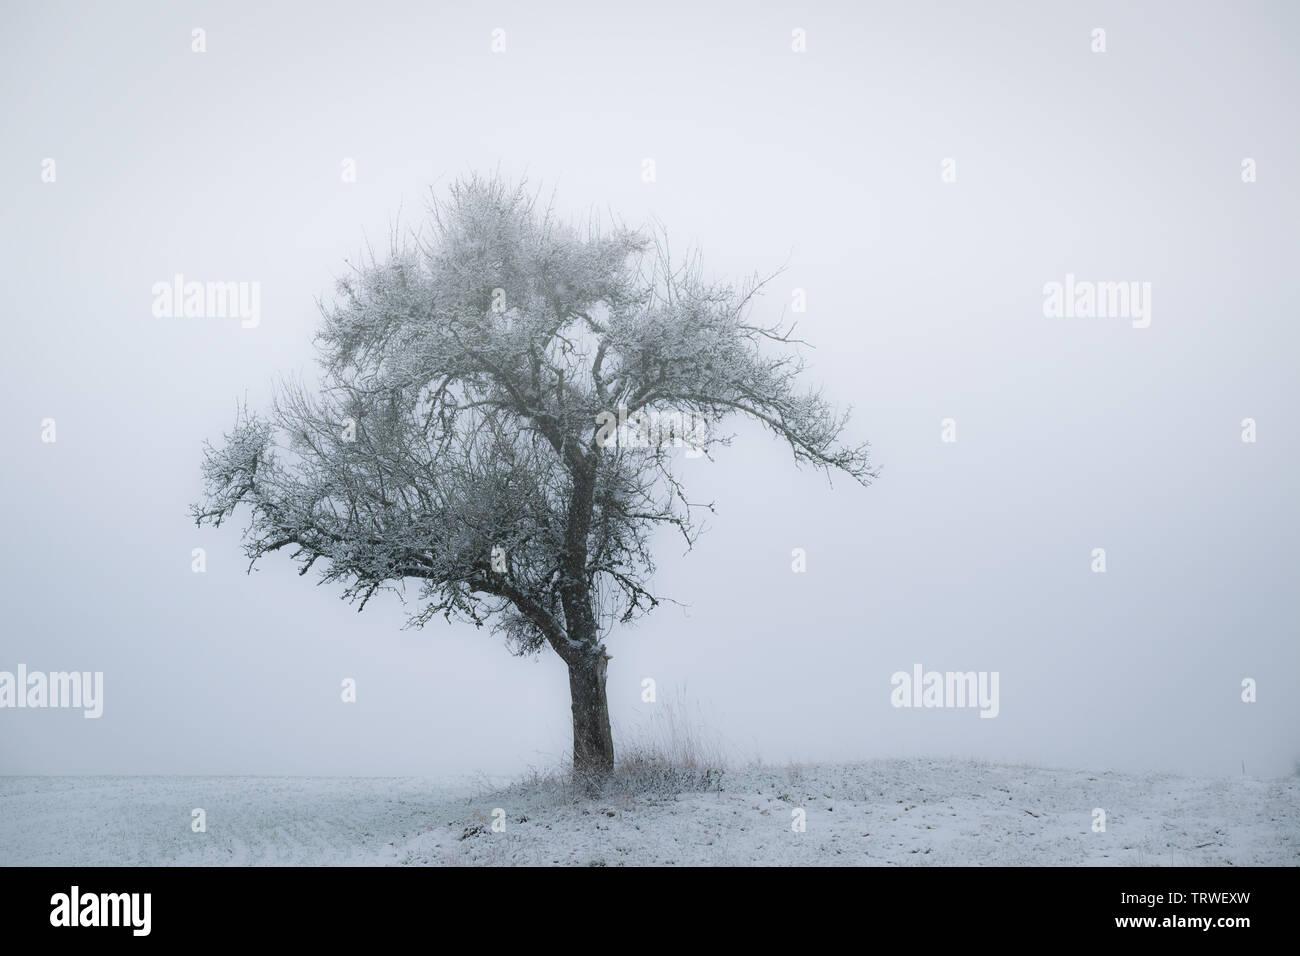 bare tree on field against misty sky in winter - Stock Image